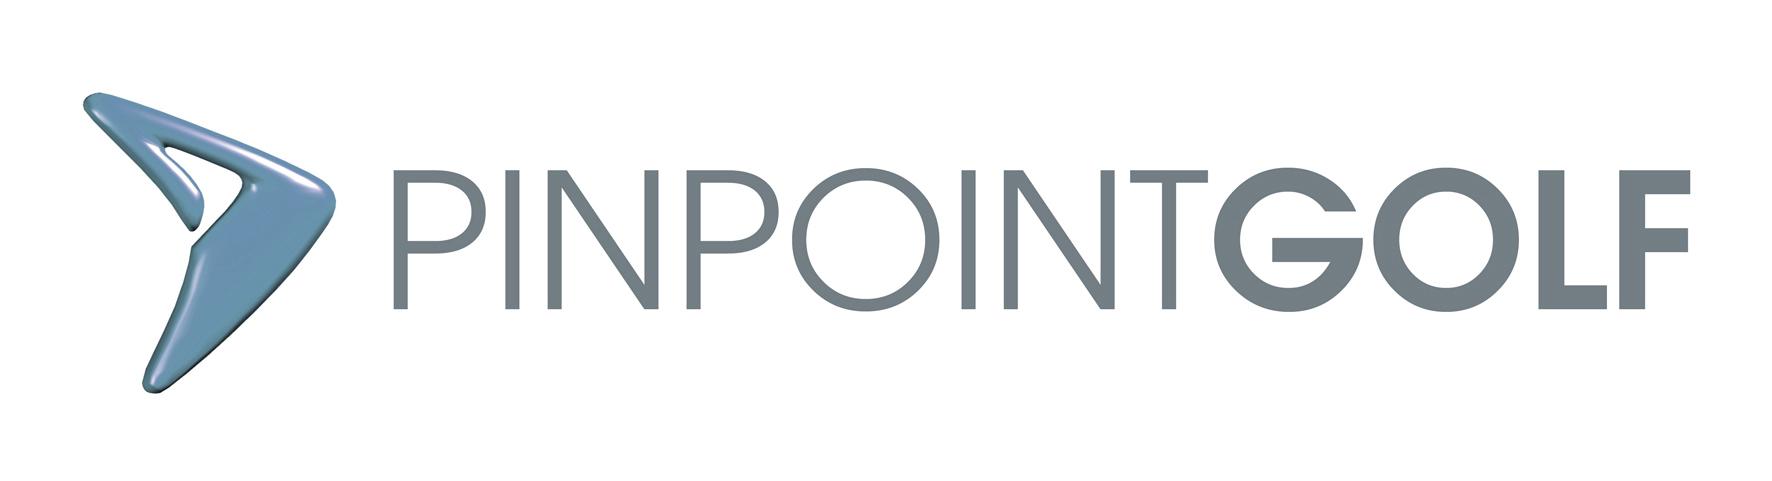 pinpoint golf logo.jpg